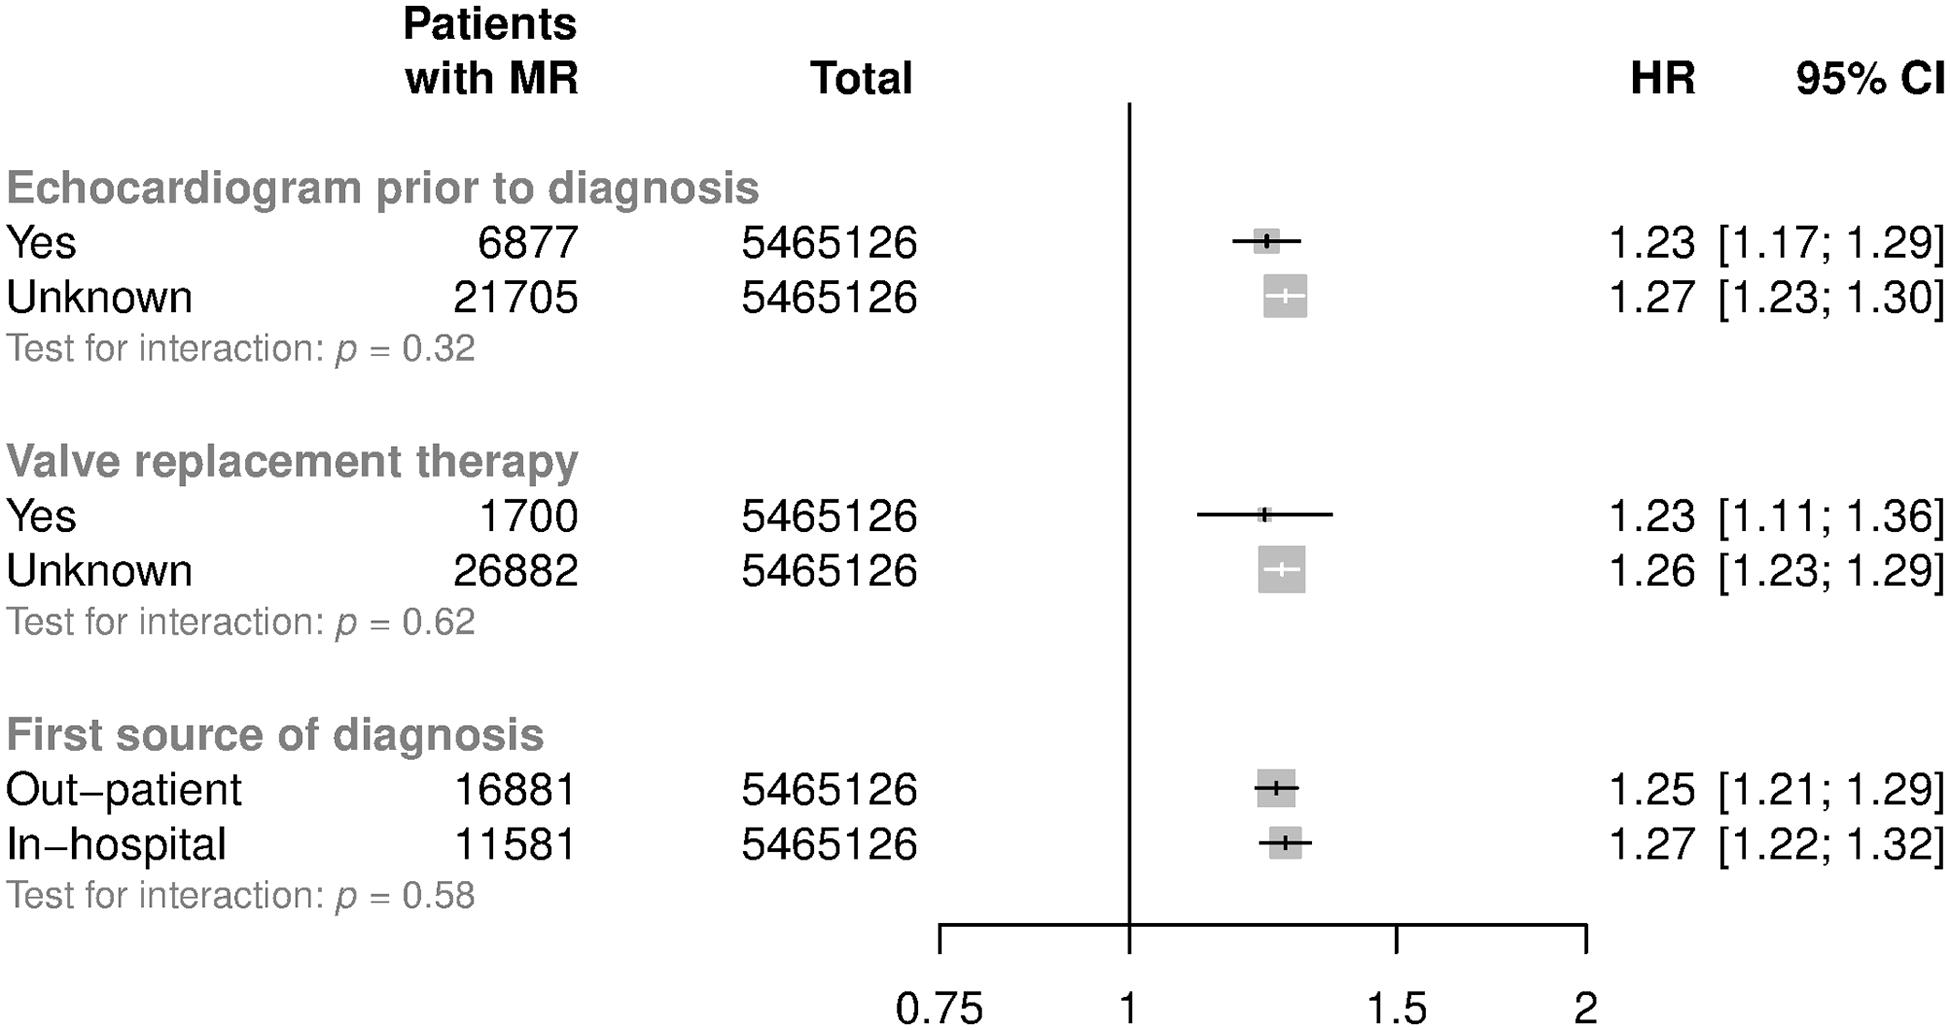 Subgroup analyses for mitral regurgitation per 20 mmHg higher usual SBP.